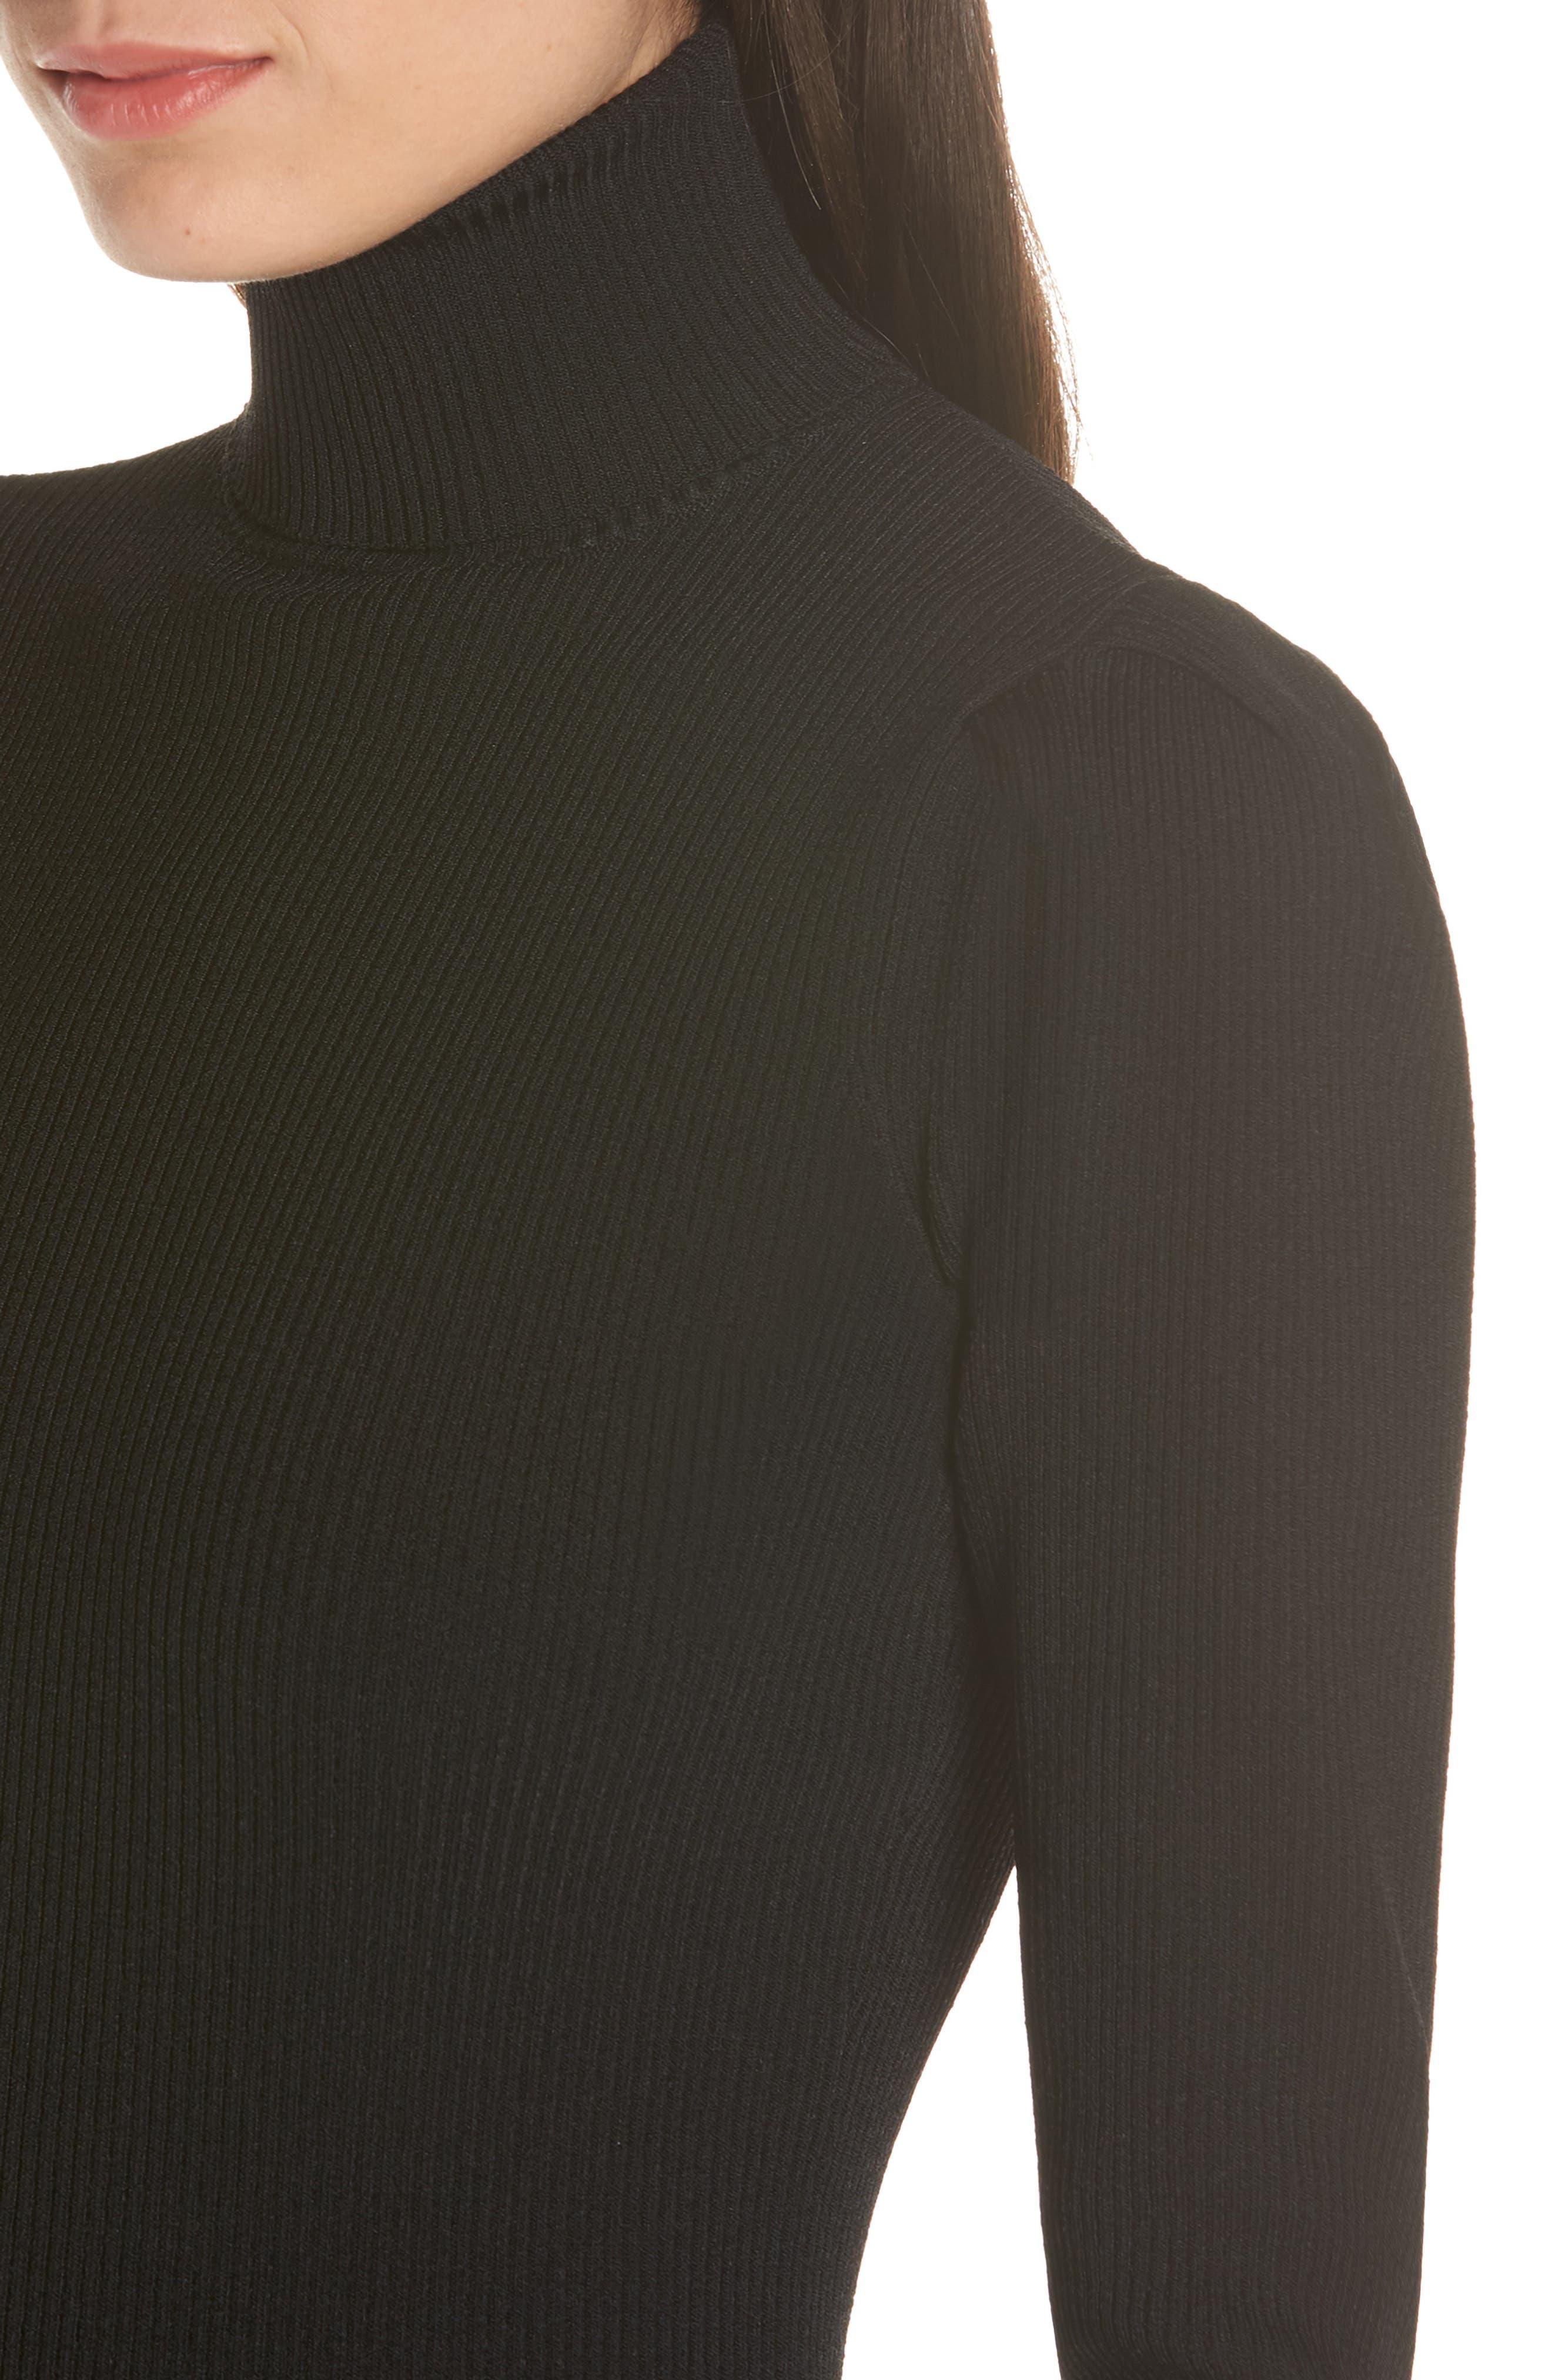 ALI & JAY, Best of My Love Turtleneck Sweater Dress, Alternate thumbnail 4, color, 001